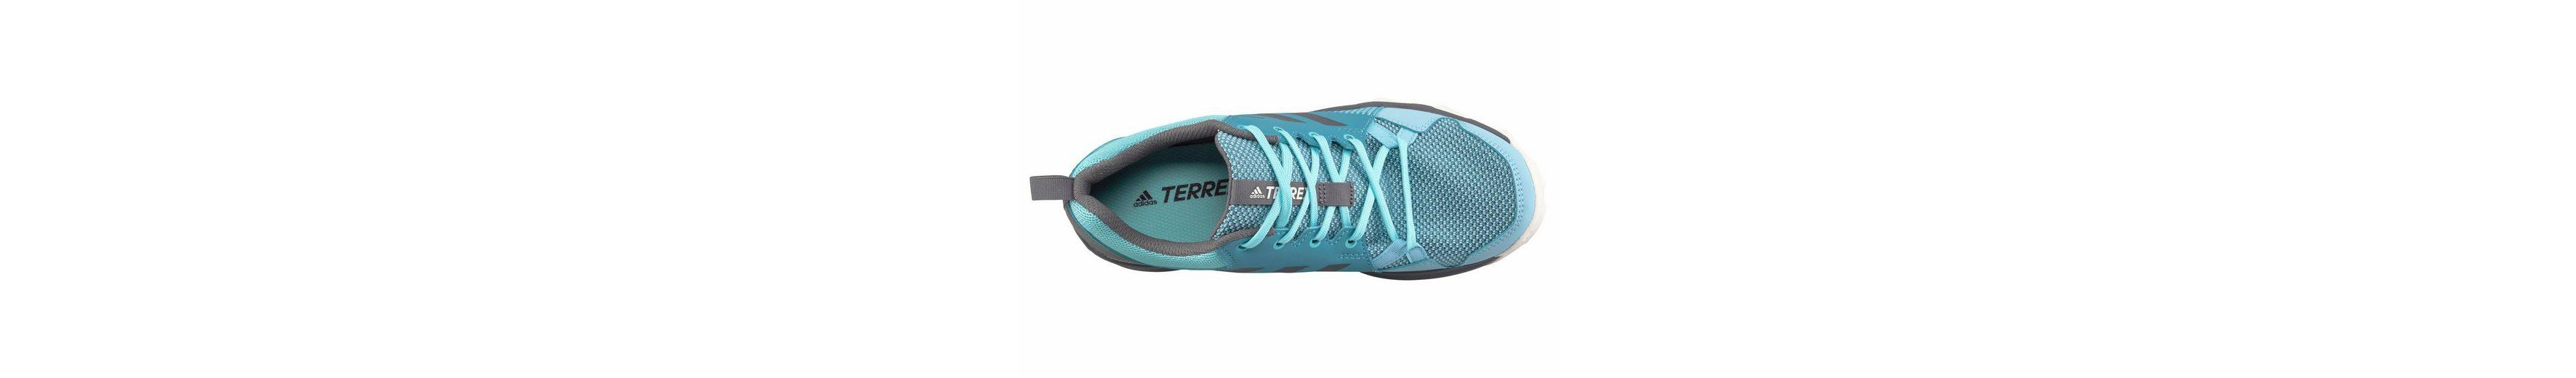 Outdoorschuh W adidas adidas Performance Performance Terrex Tracerocker nfvYXxwq